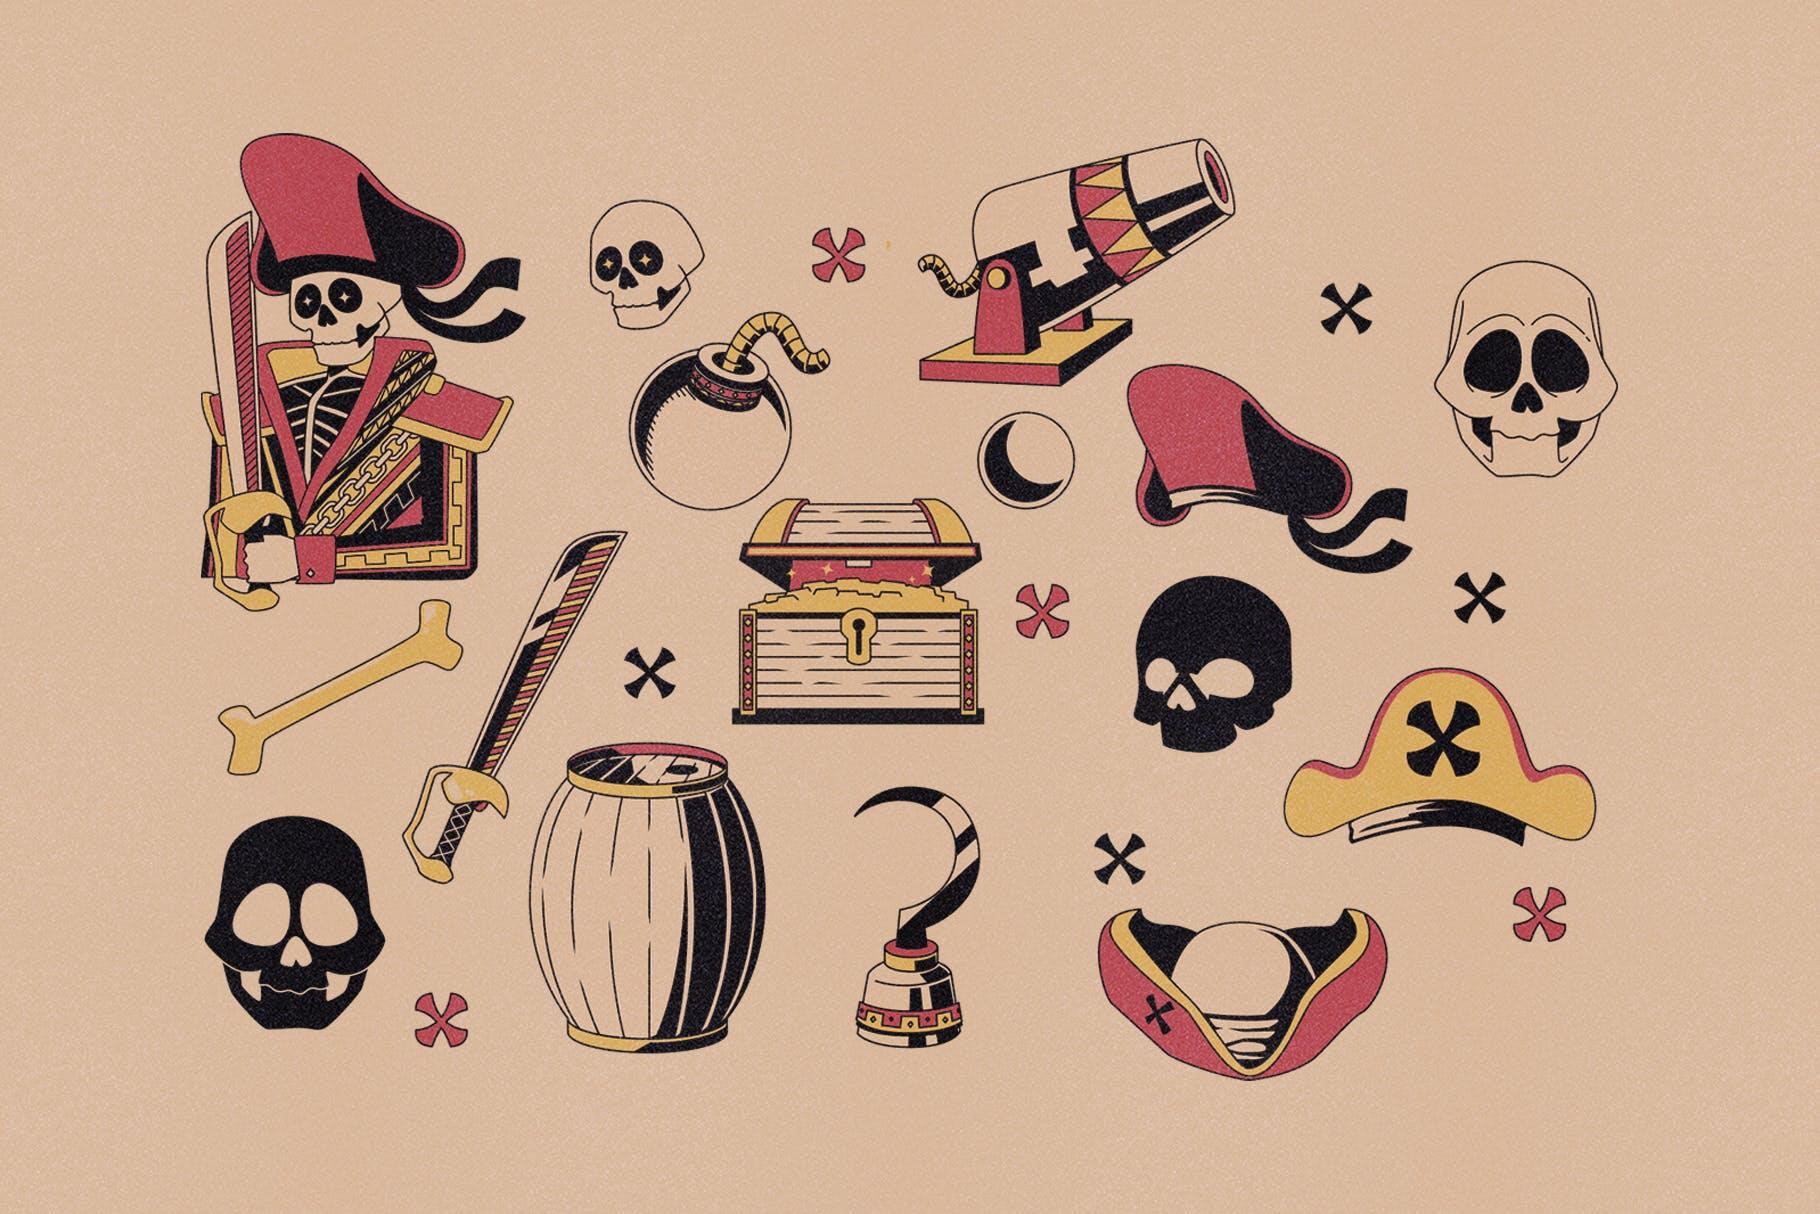 海盗元素徽标LOGO插图设计矢量素材 Illustration & Logo Pack V1插图(2)